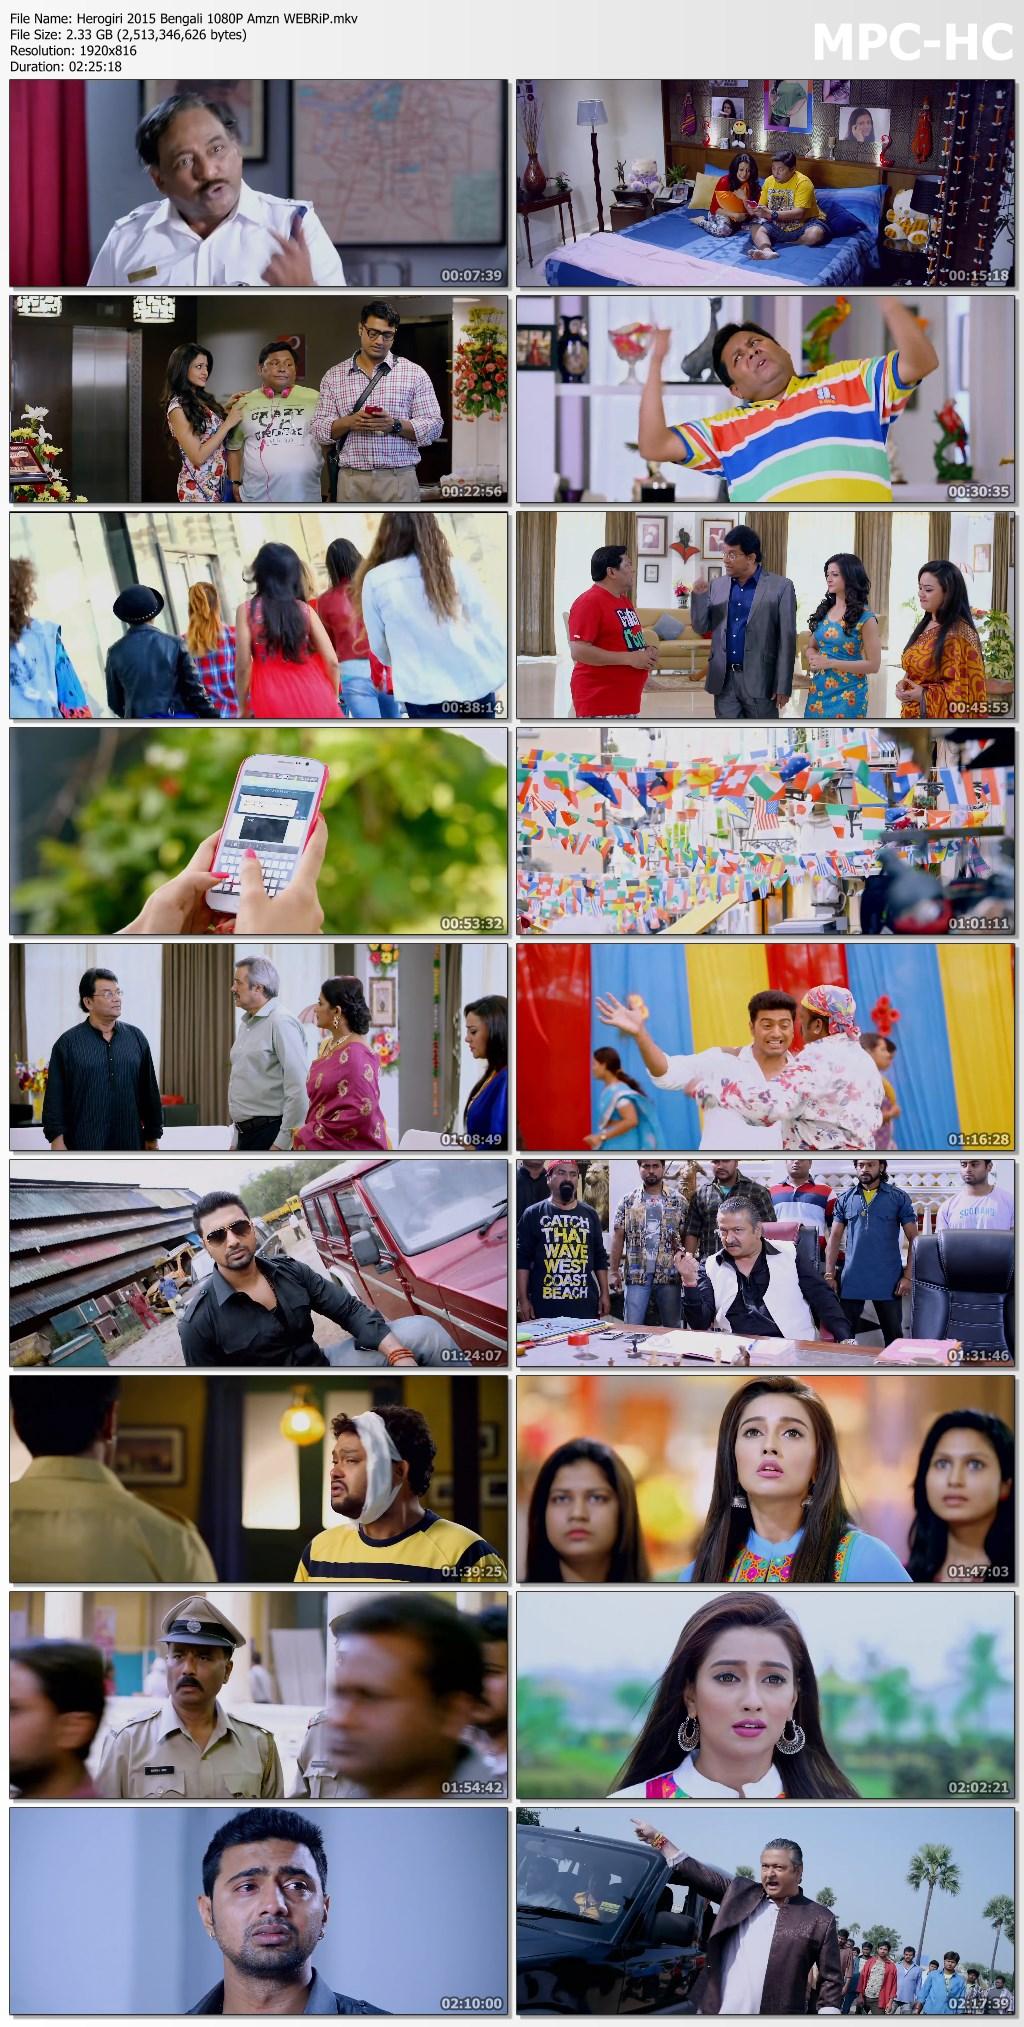 Herogiri 2015 Bengali 1080P Amzn WEBRiP.mkv thumbs